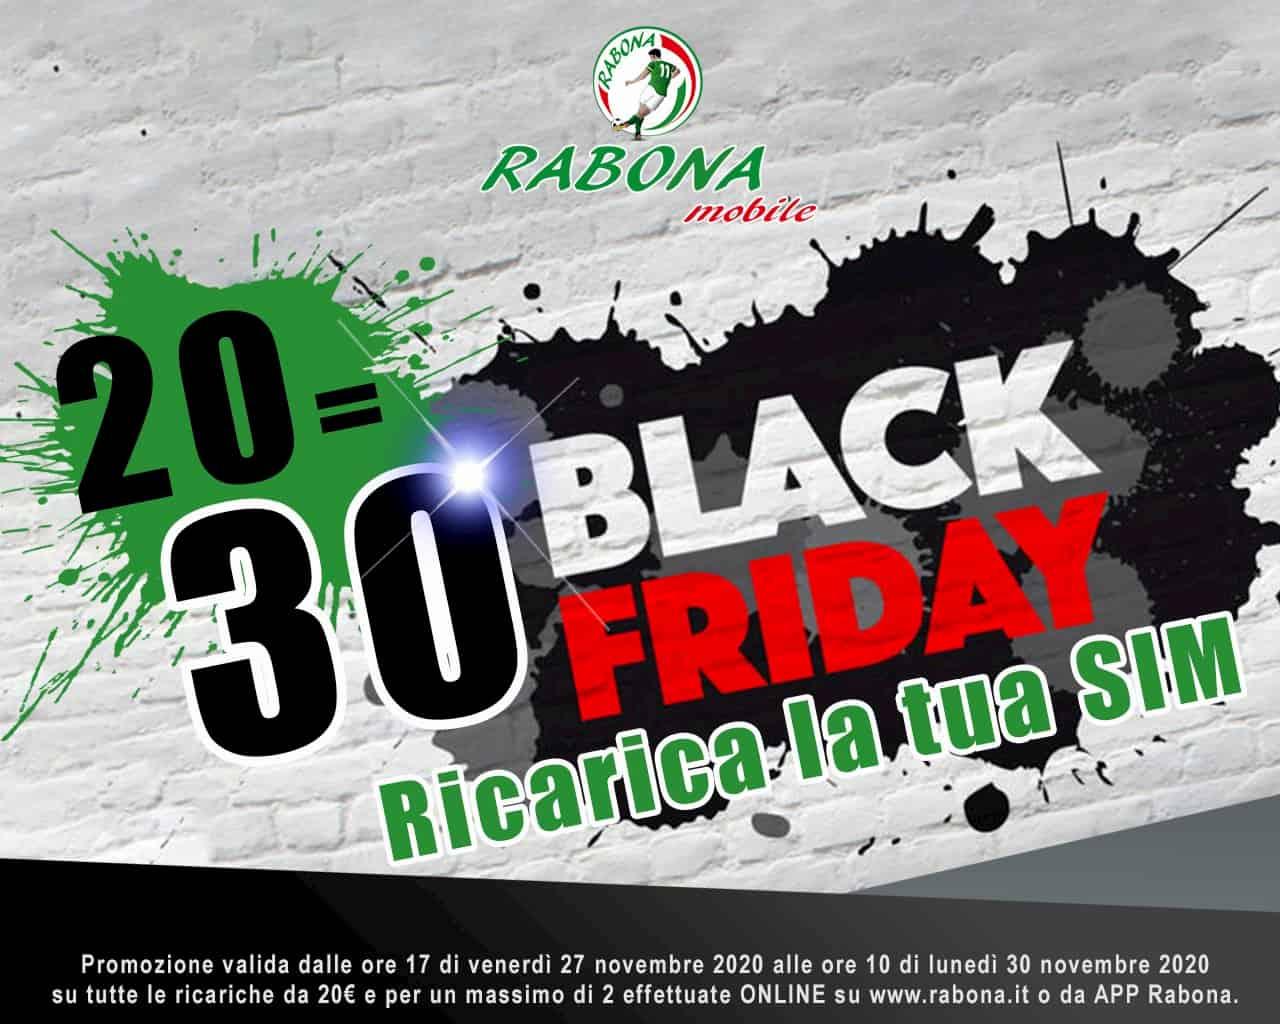 Rabona Black Friday 2020